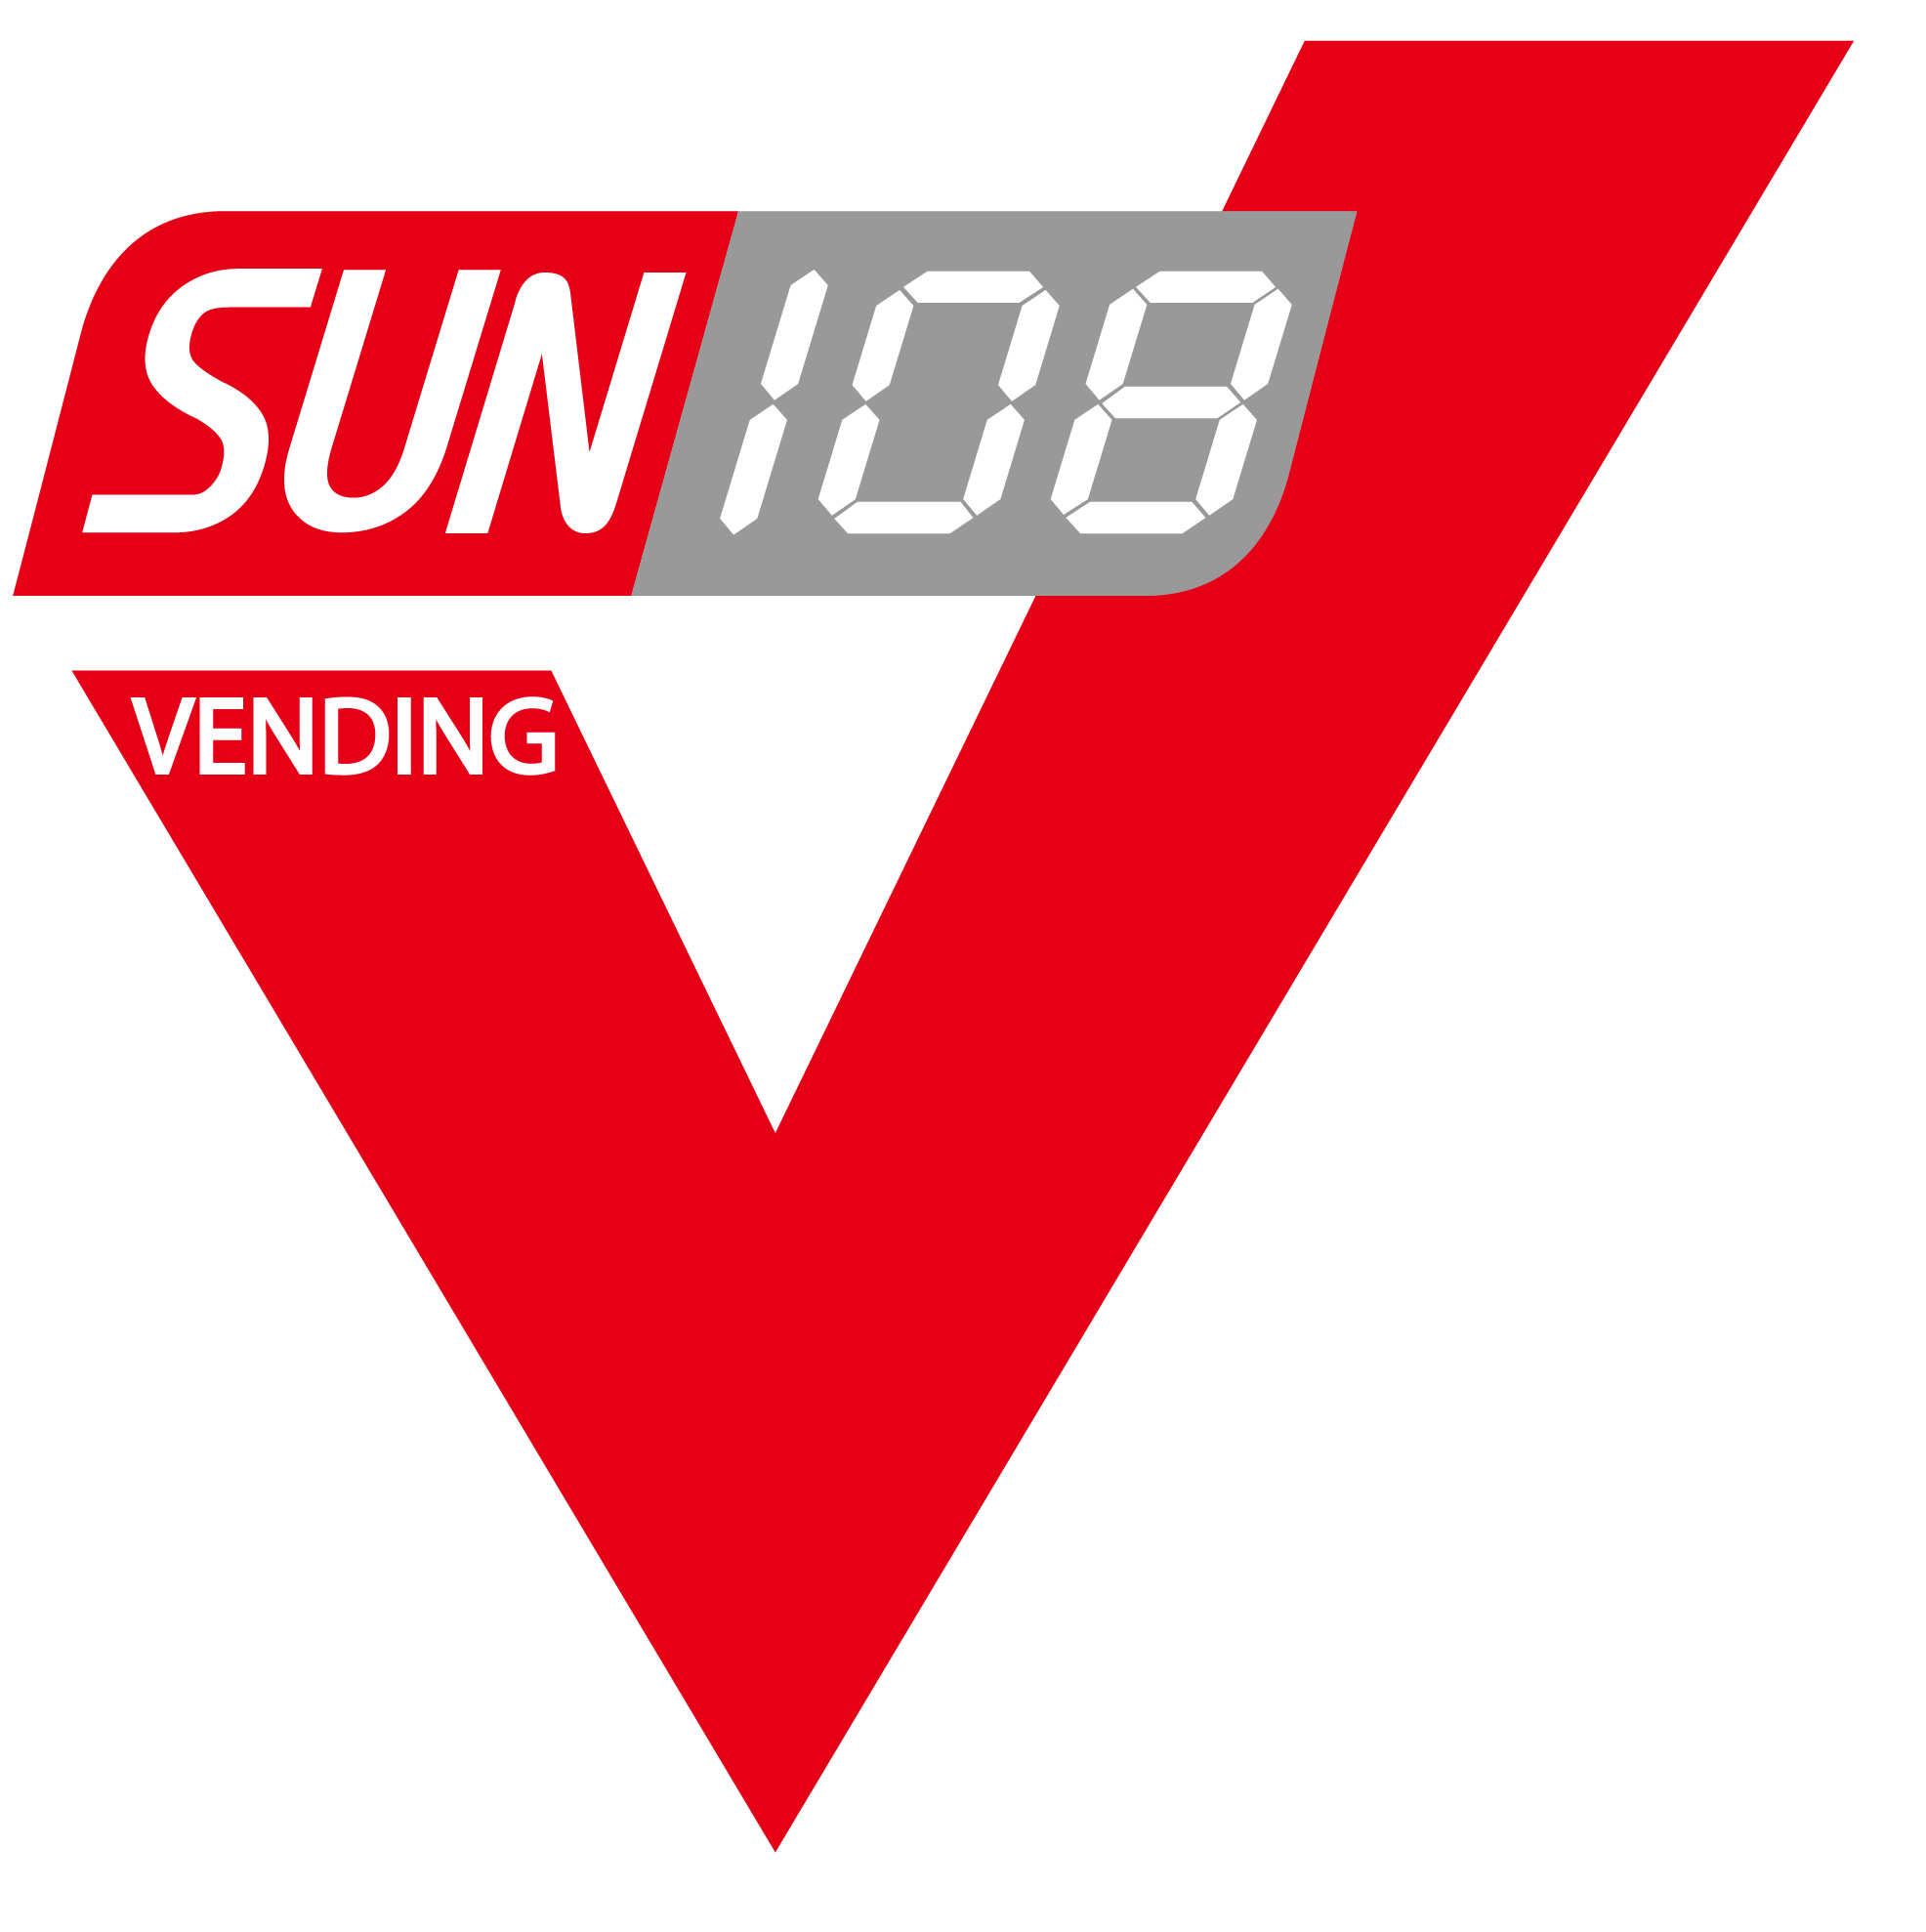 SUN108 Vending